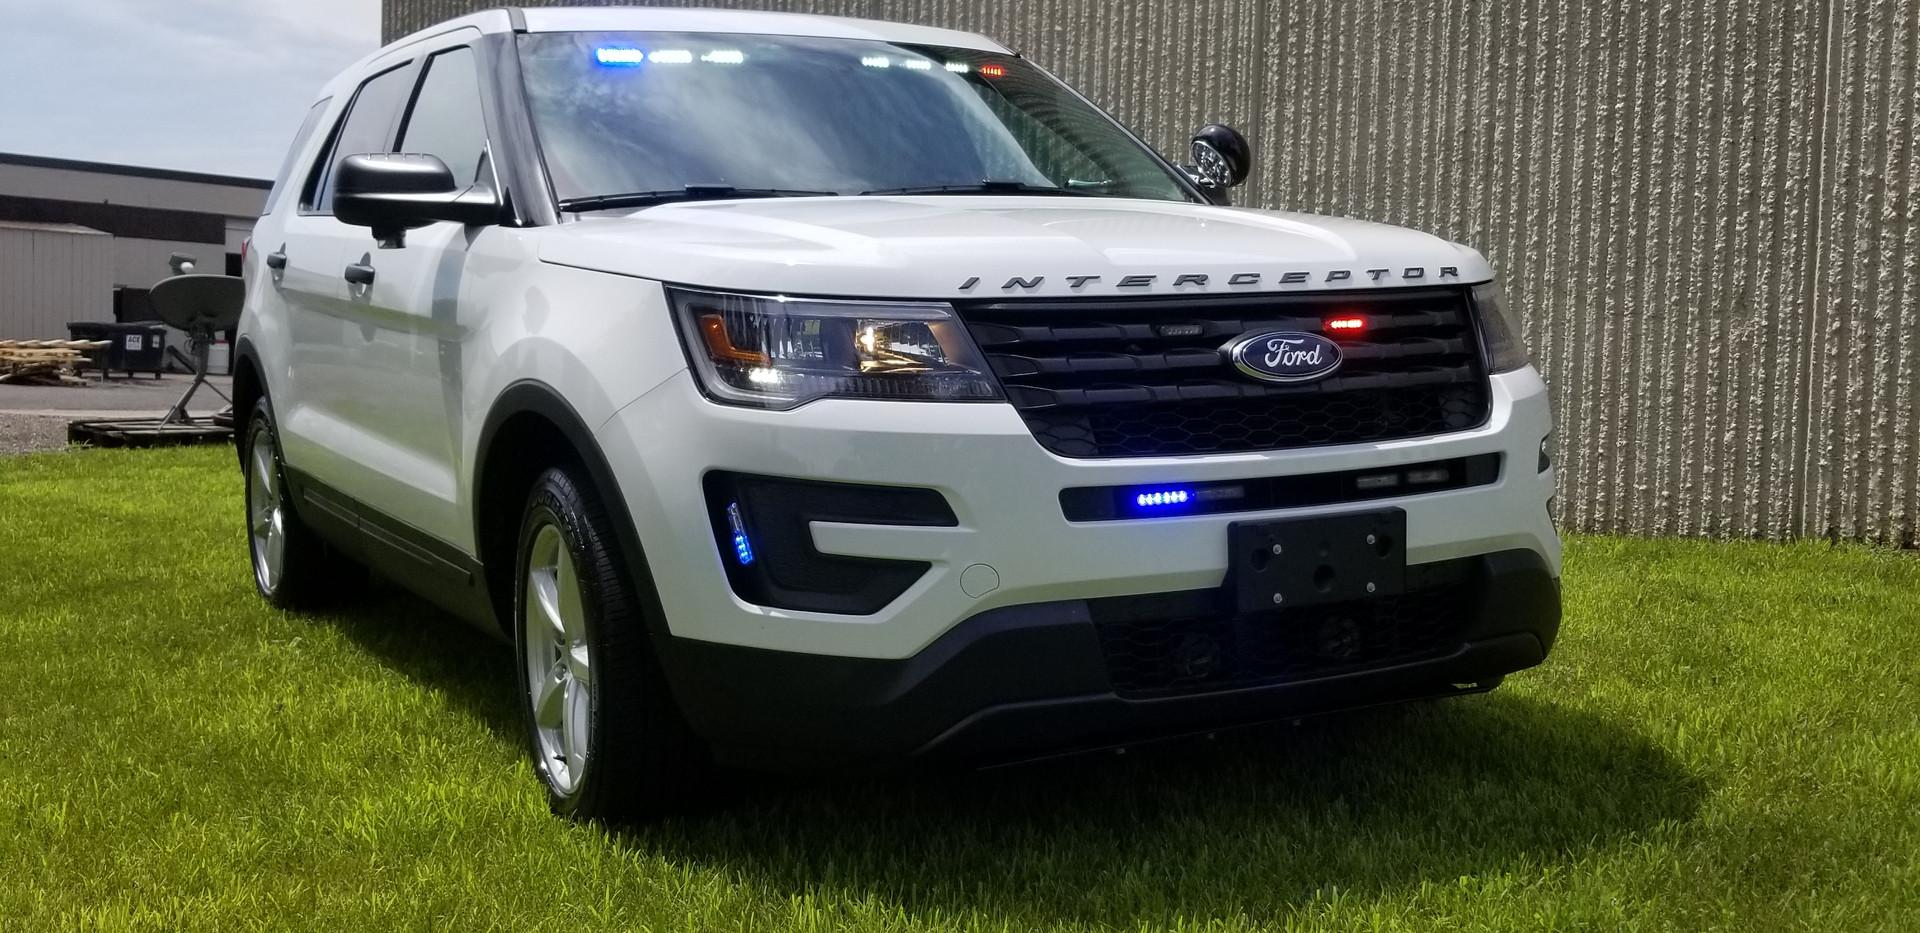 Rogers Police Department - Admin 3.jpg